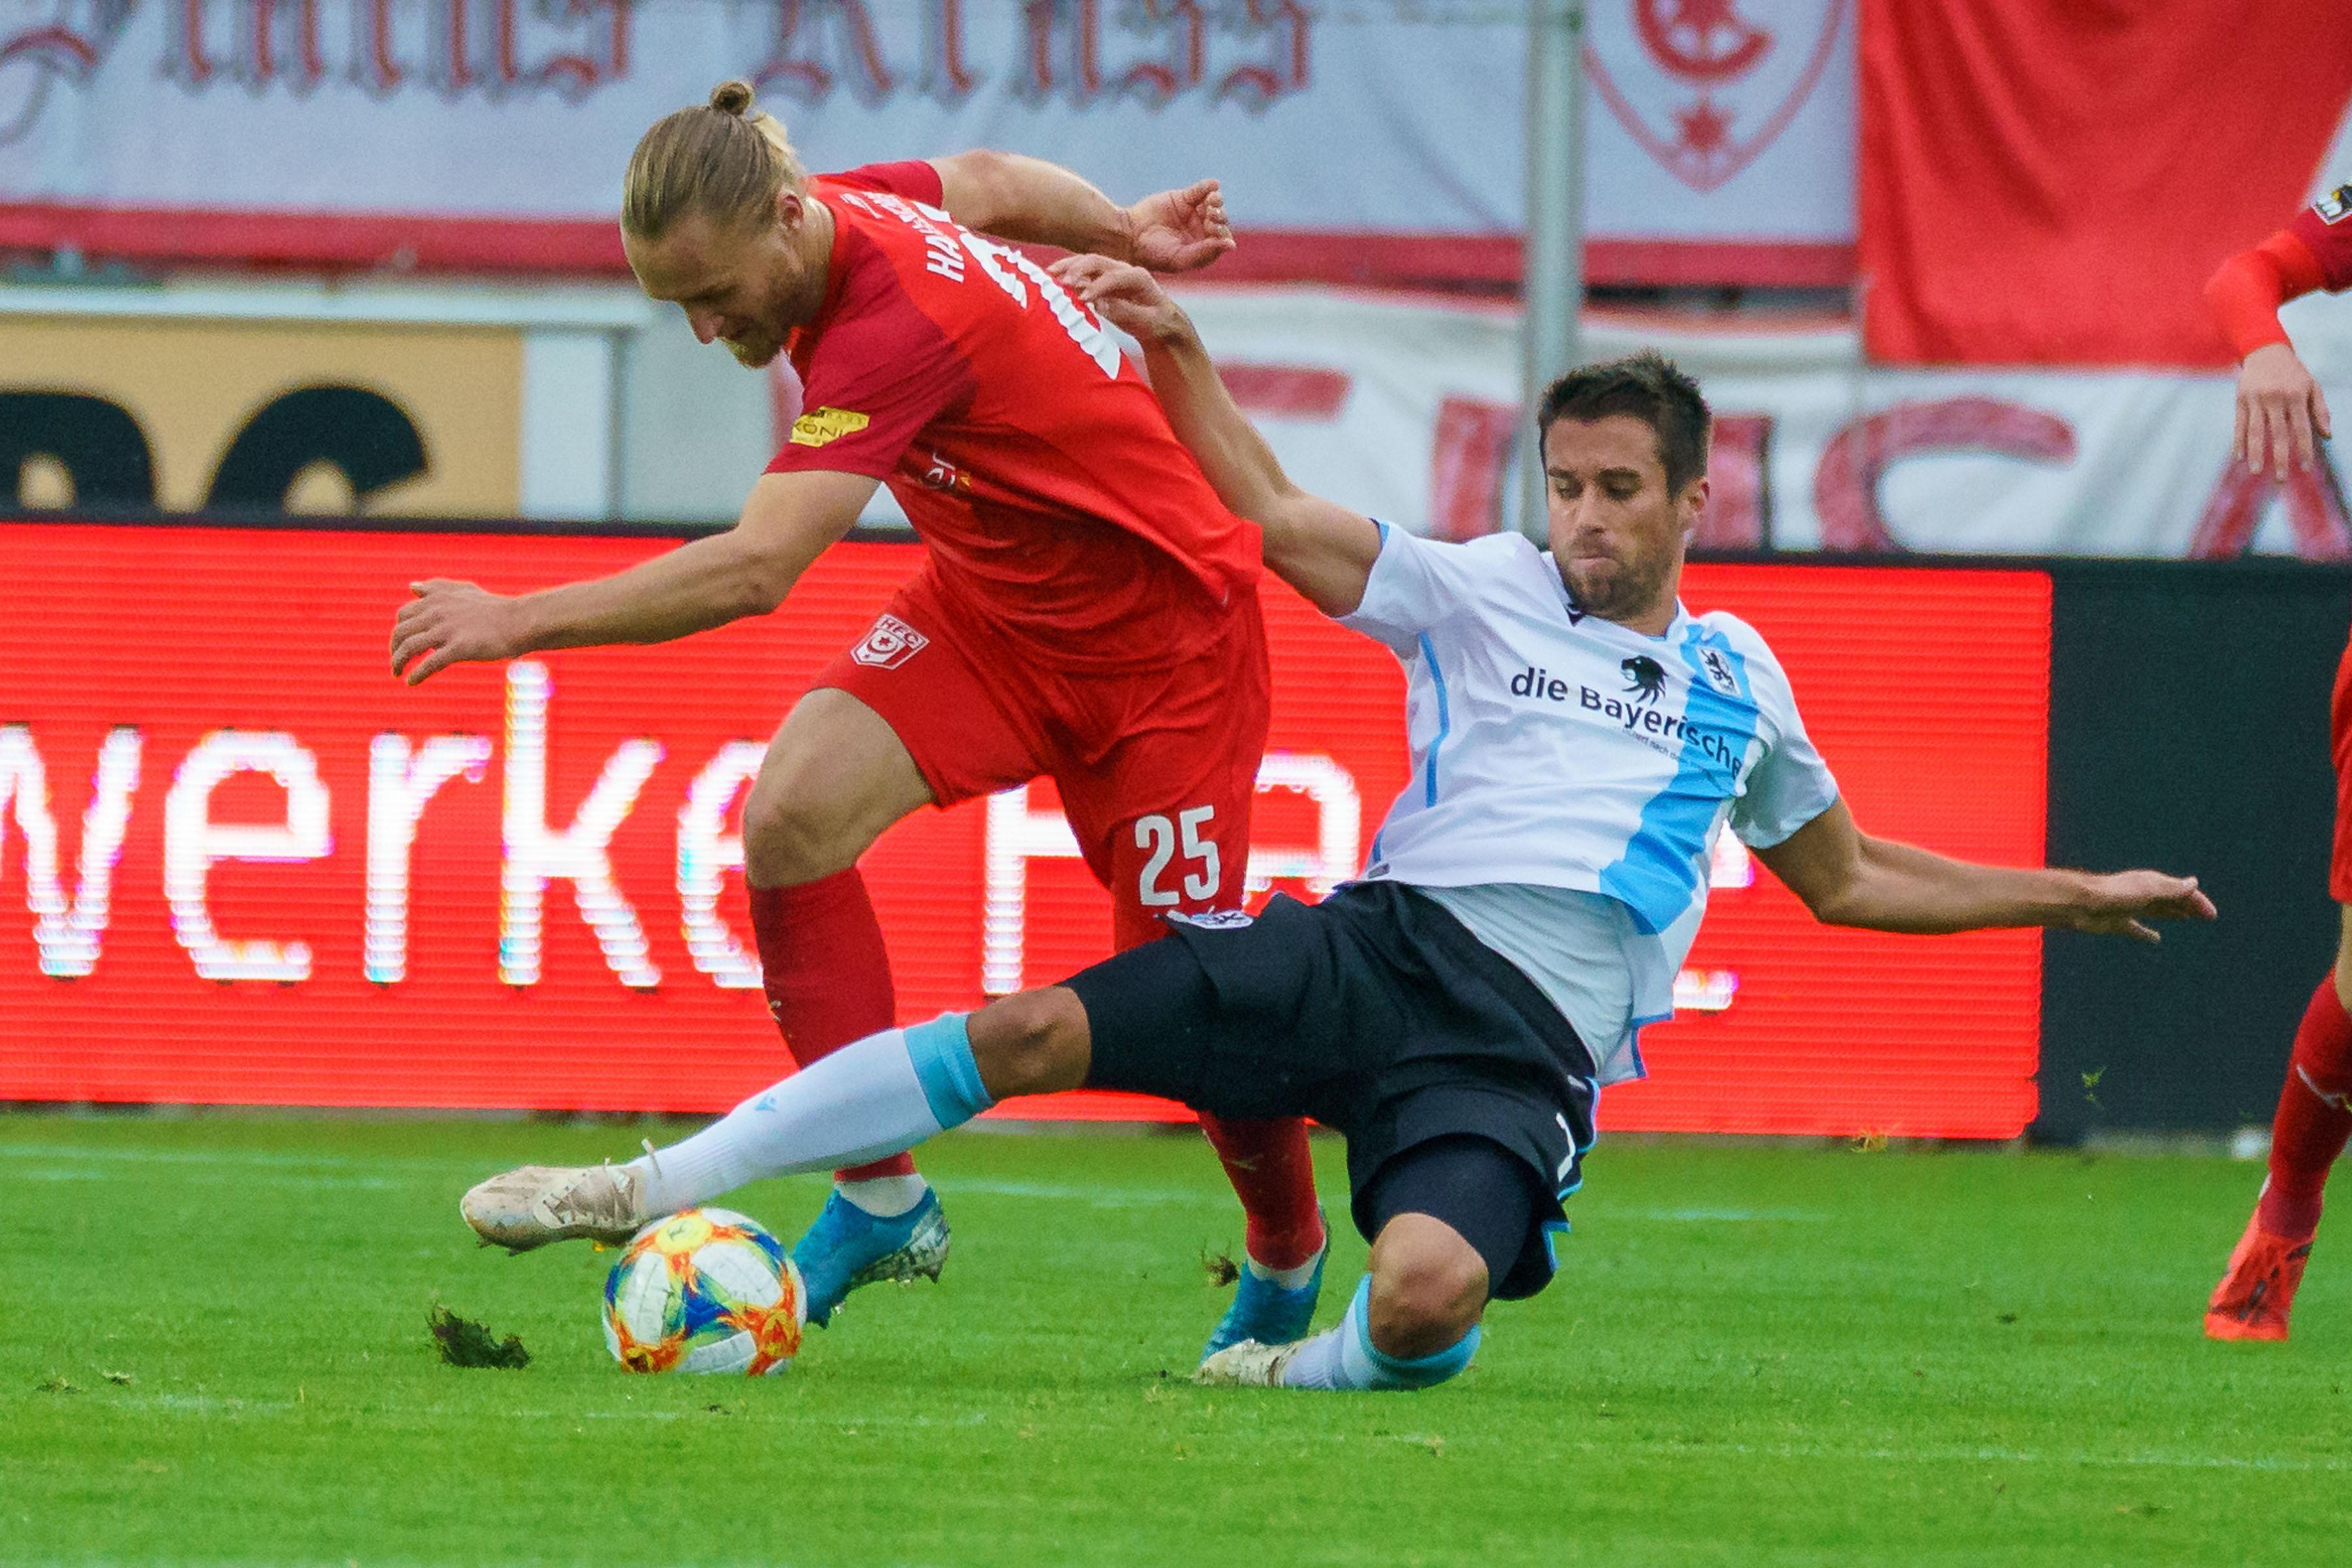 Spielszene Hallescher FC - TSV 1860 München